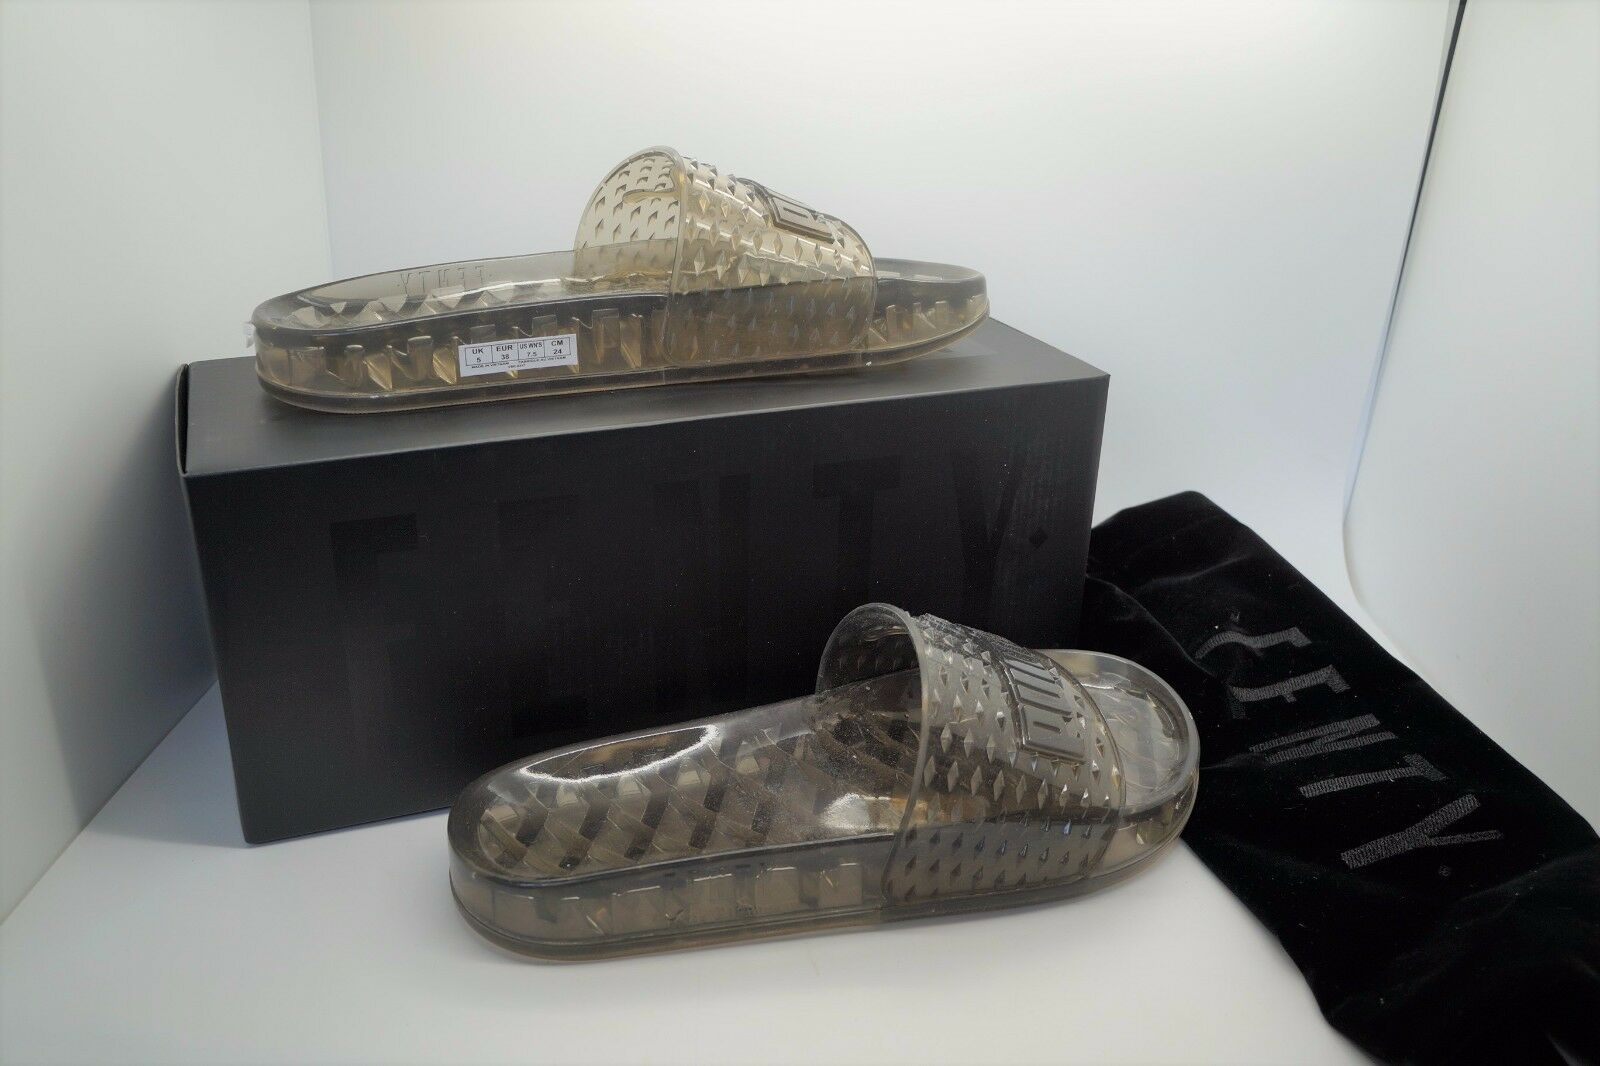 FENTY Rihanna x PUMA Authentic Black Jelly Slides shoes Sz US 7.5 NIB NEW